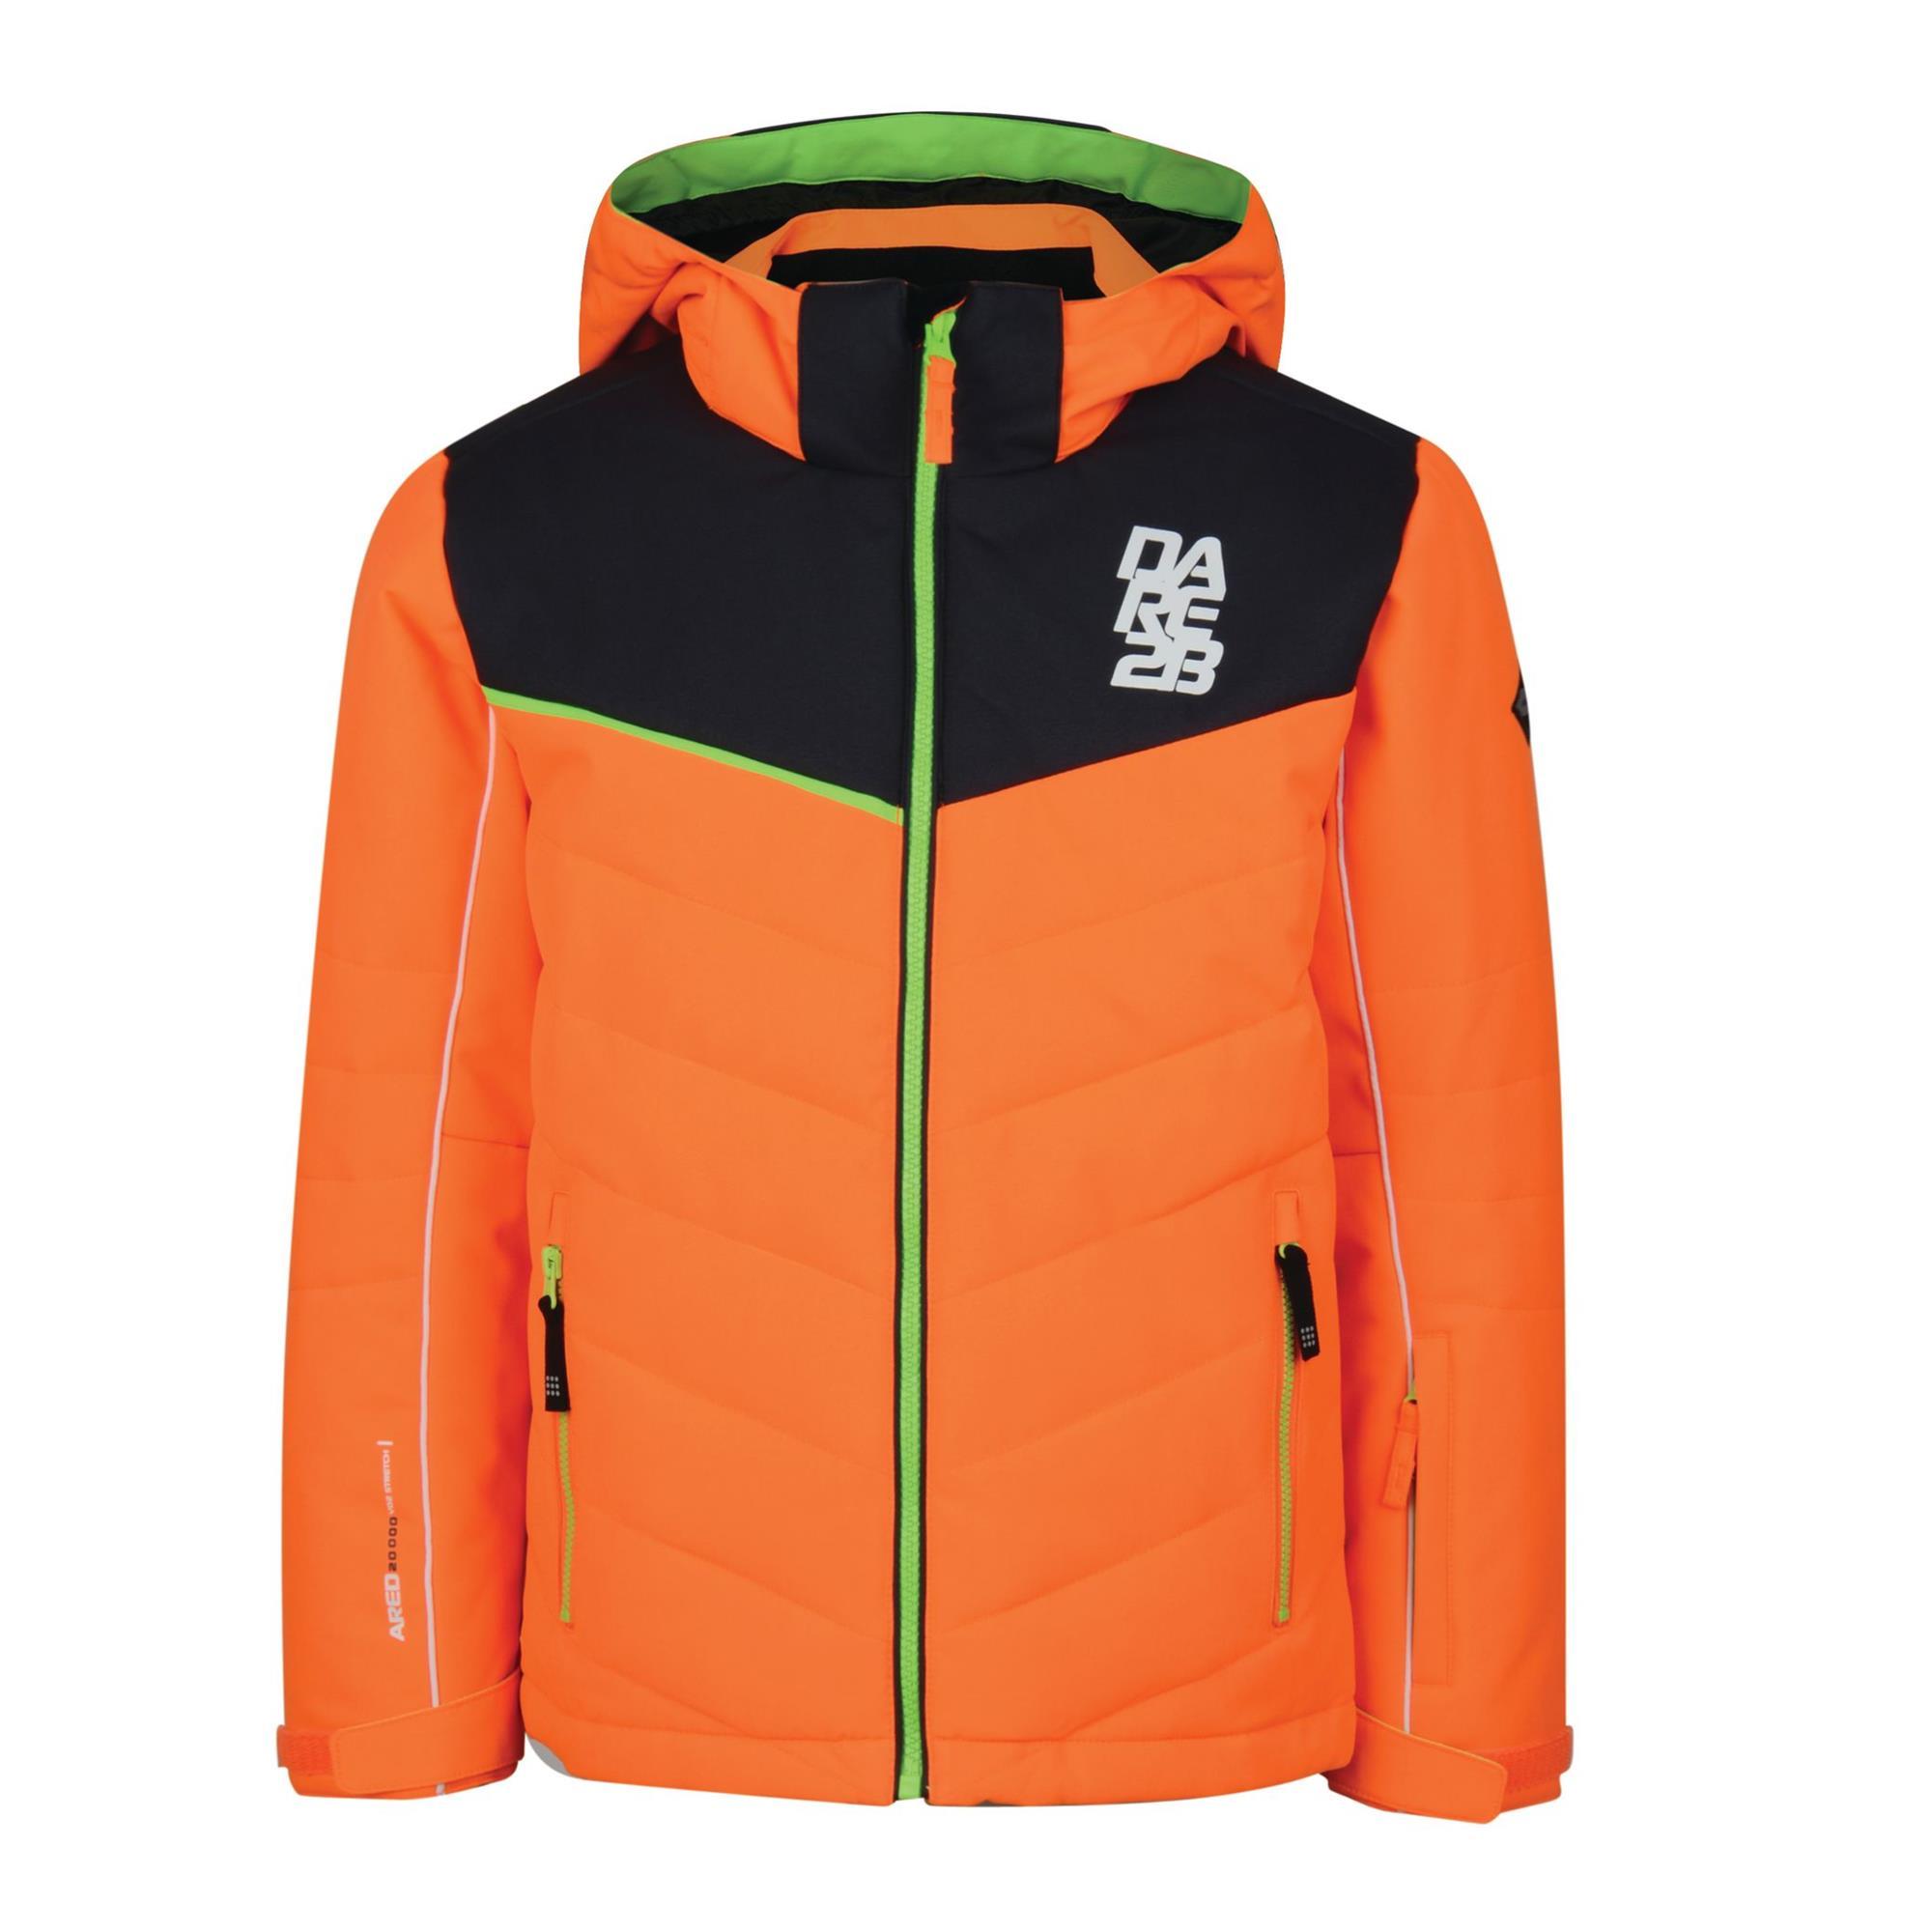 dare2b Tusk II Jacket Kinder Skijacke orange 116, Gr. 116